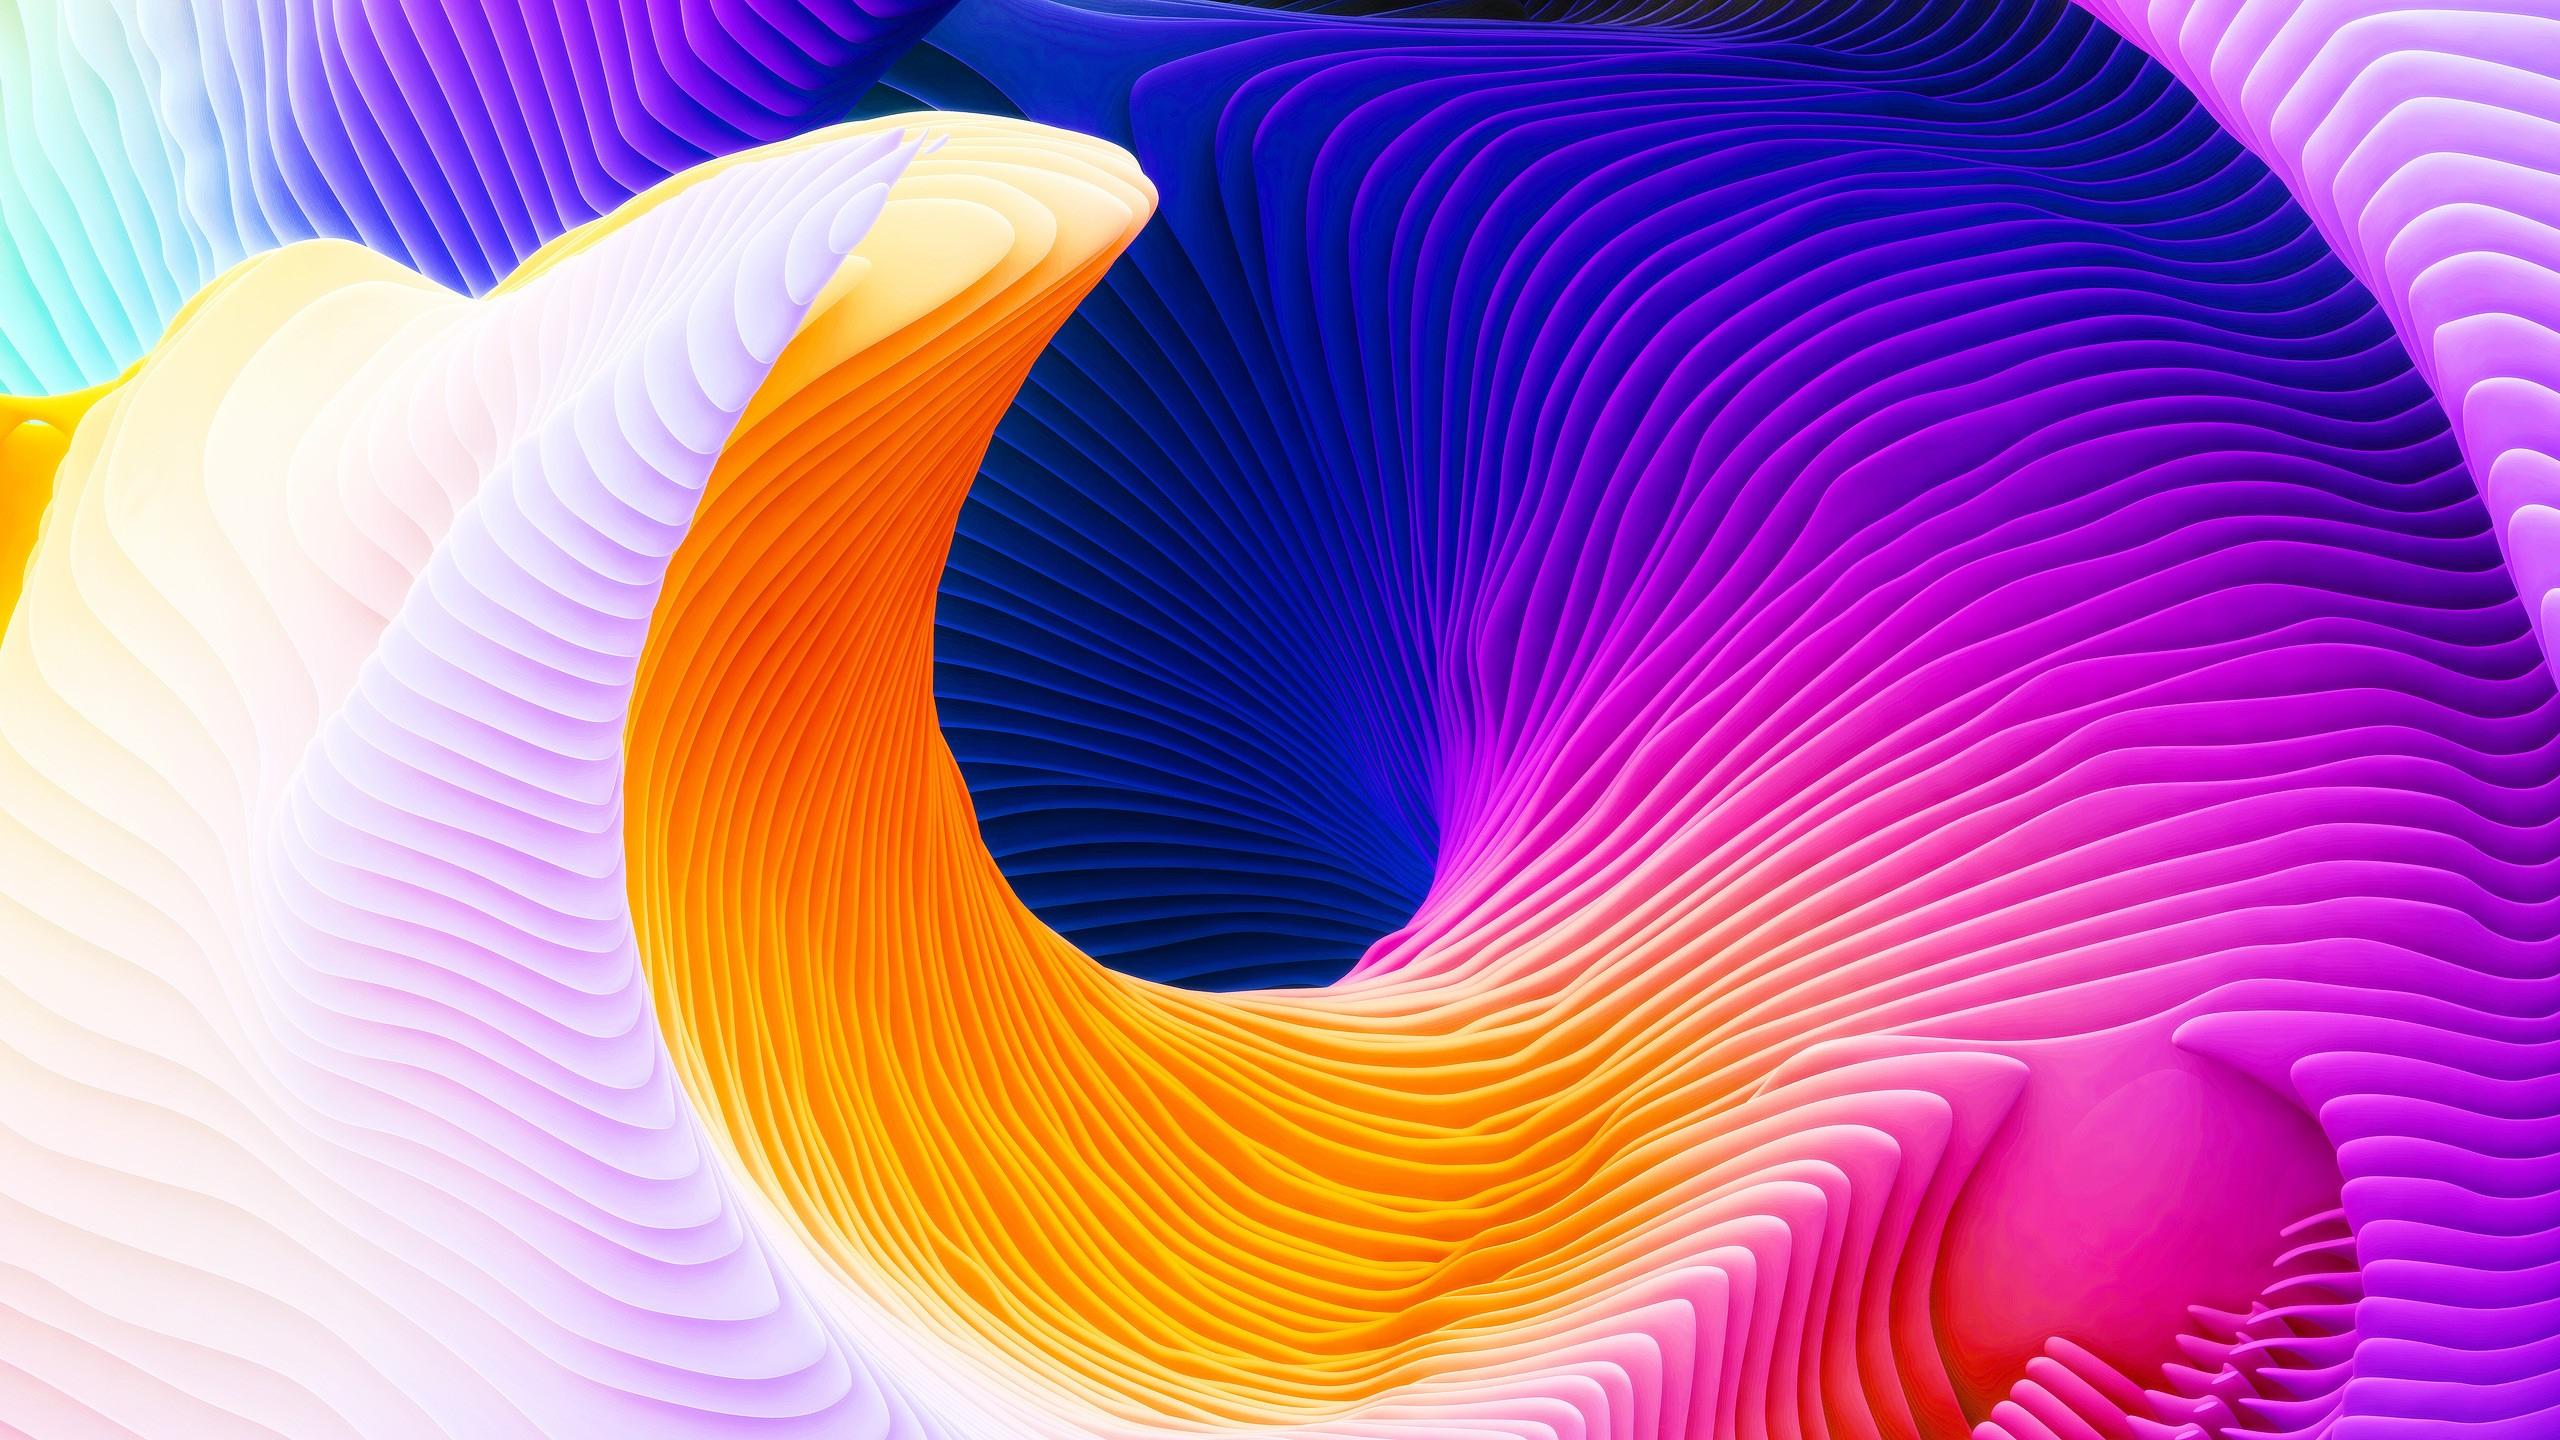 wallpaper macbook pro, iphone wallpaper, 4k, 5k, live wallpaper, 3d